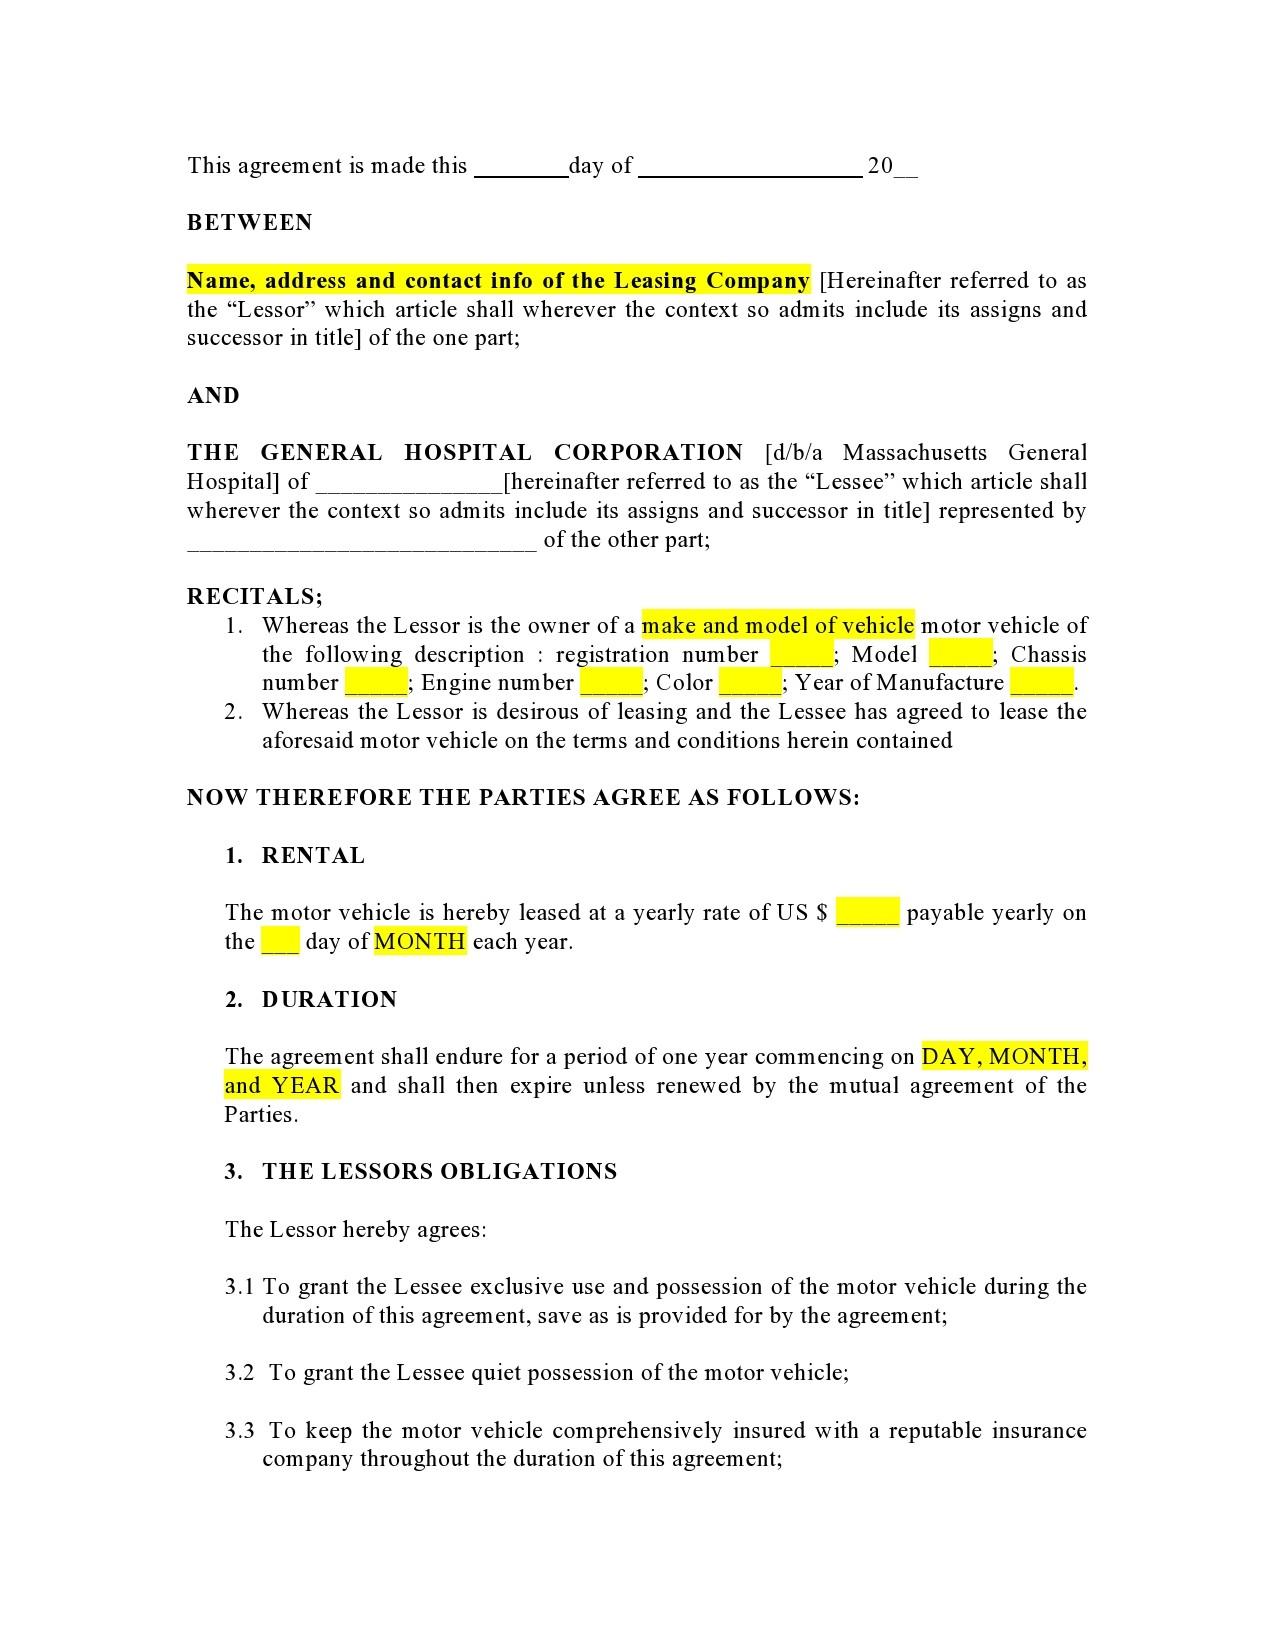 Free car rental agreement 19